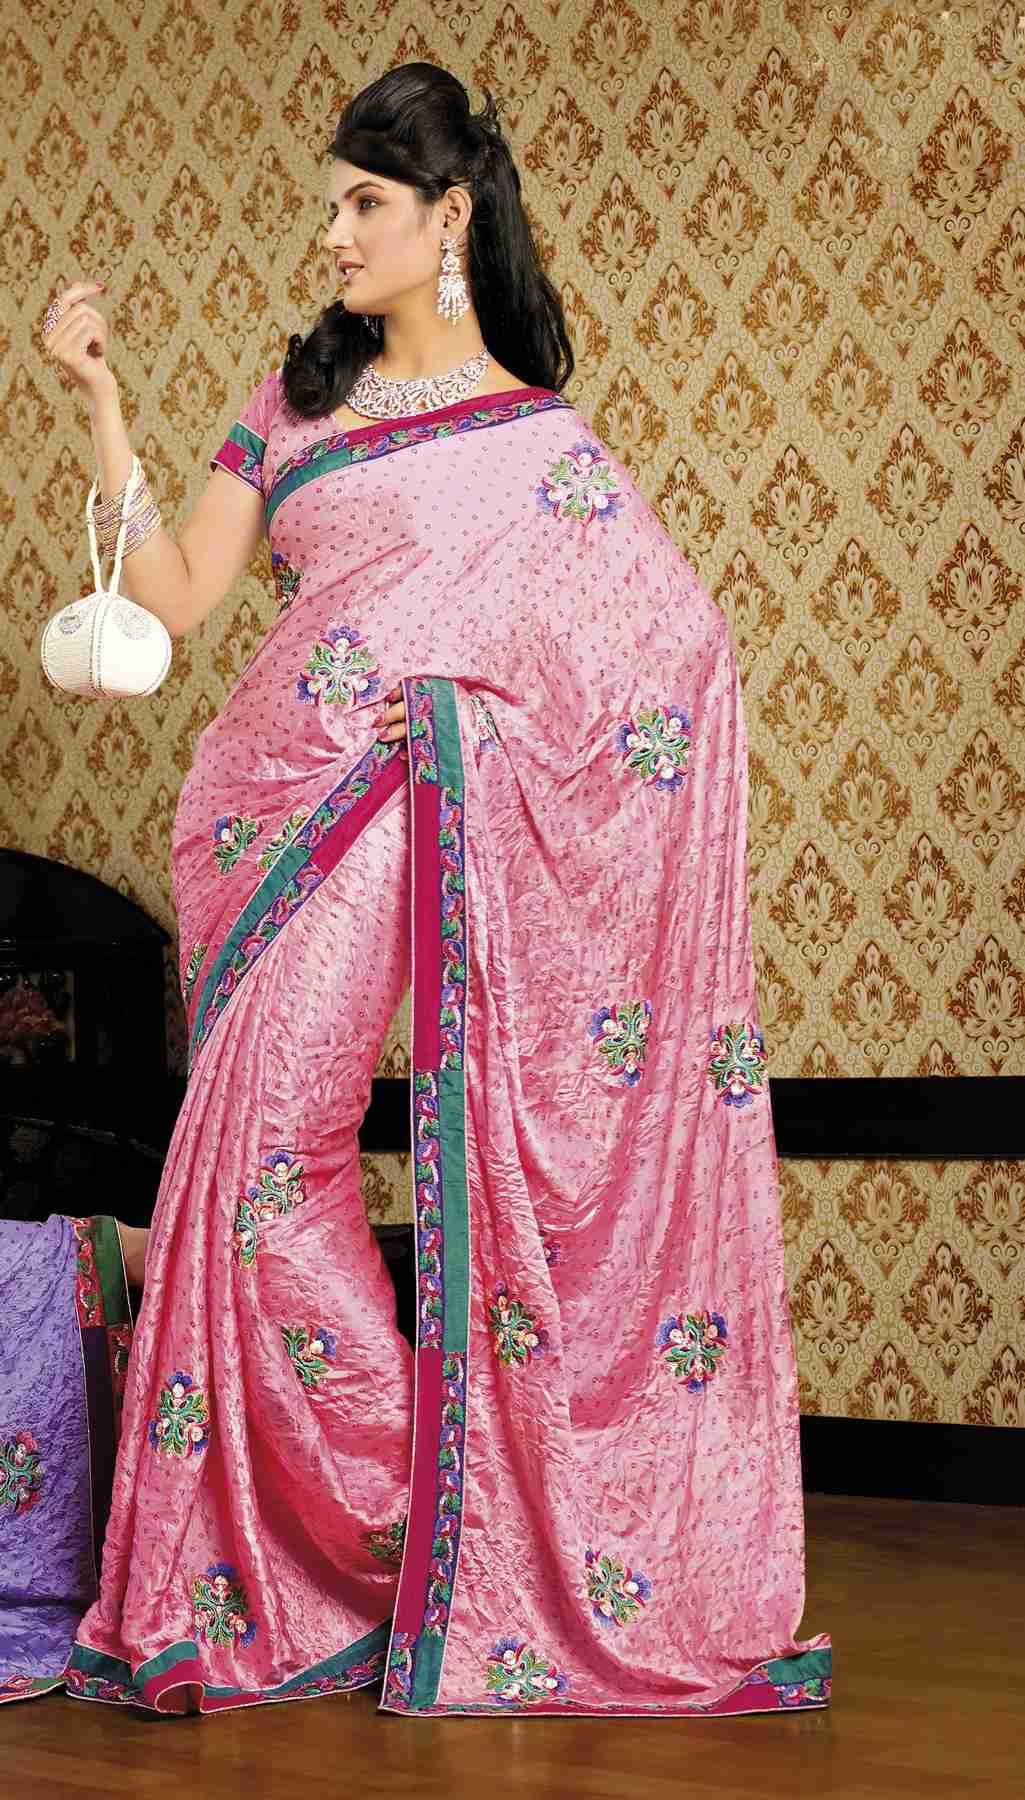 Devangi Deep Pink Faux Crepe Luxury Party Wear Sari saree